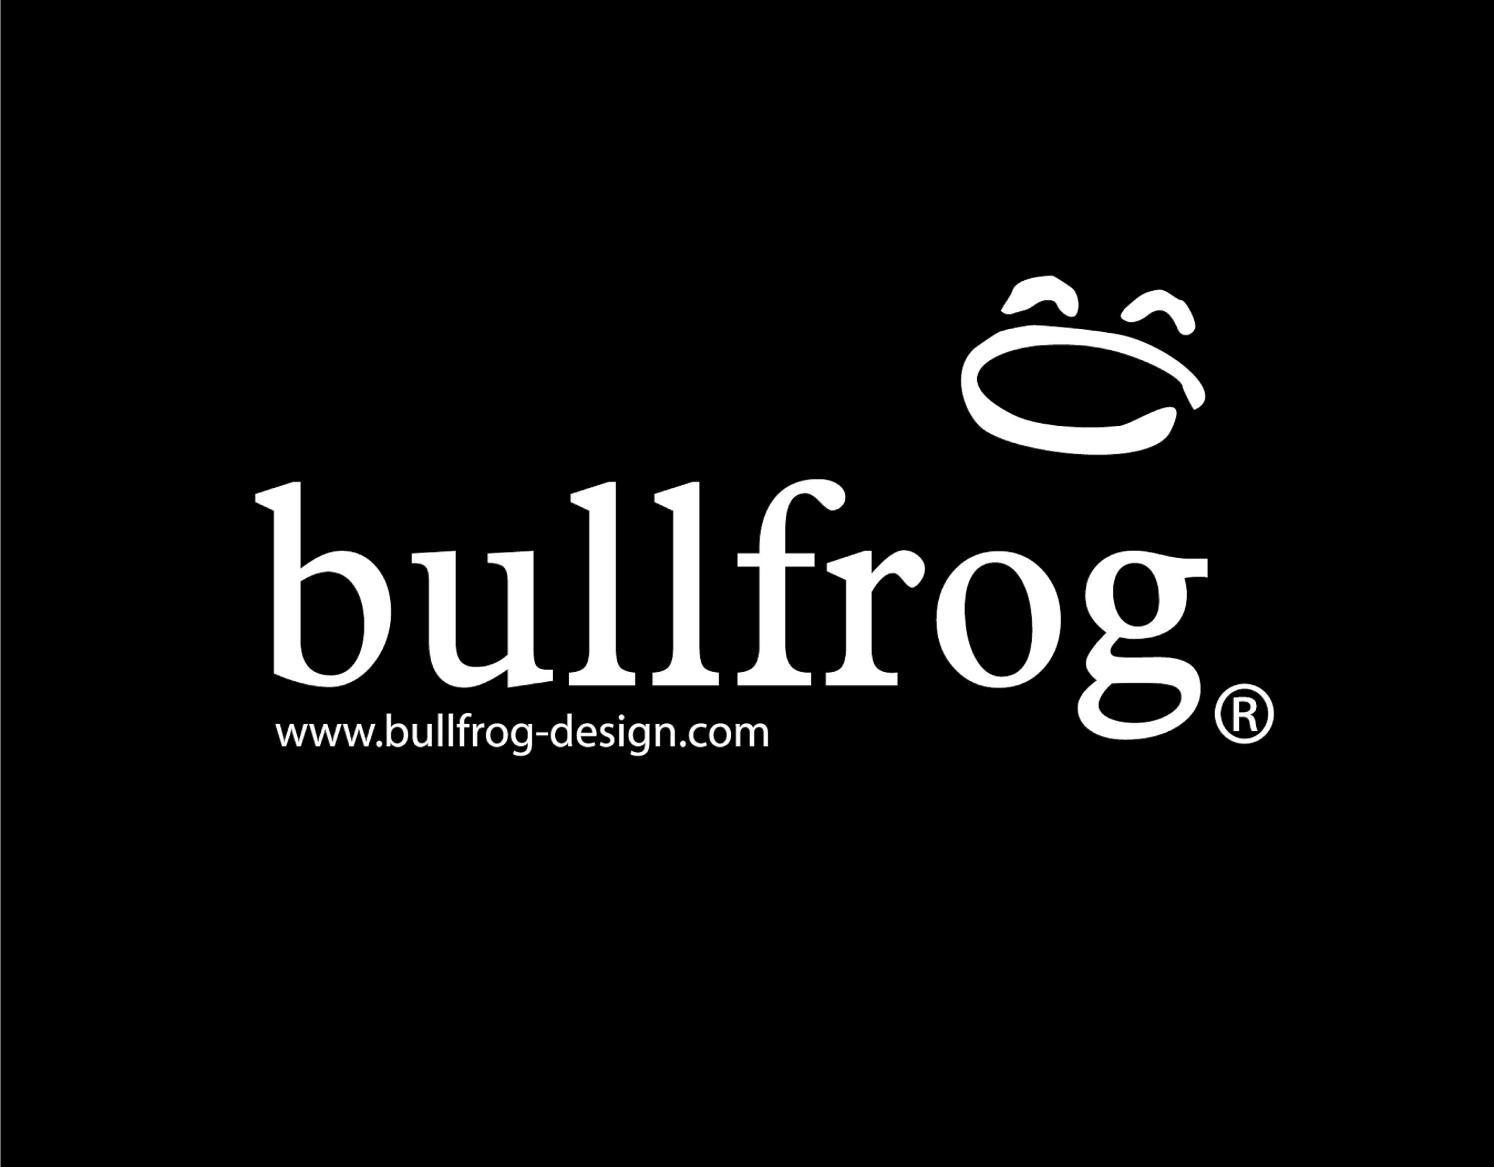 Full Size of Bullfrog Lulu Sofa Preis Catalogue By Sarsfield Brooke Wohnzimmer Bullfrog Lulu